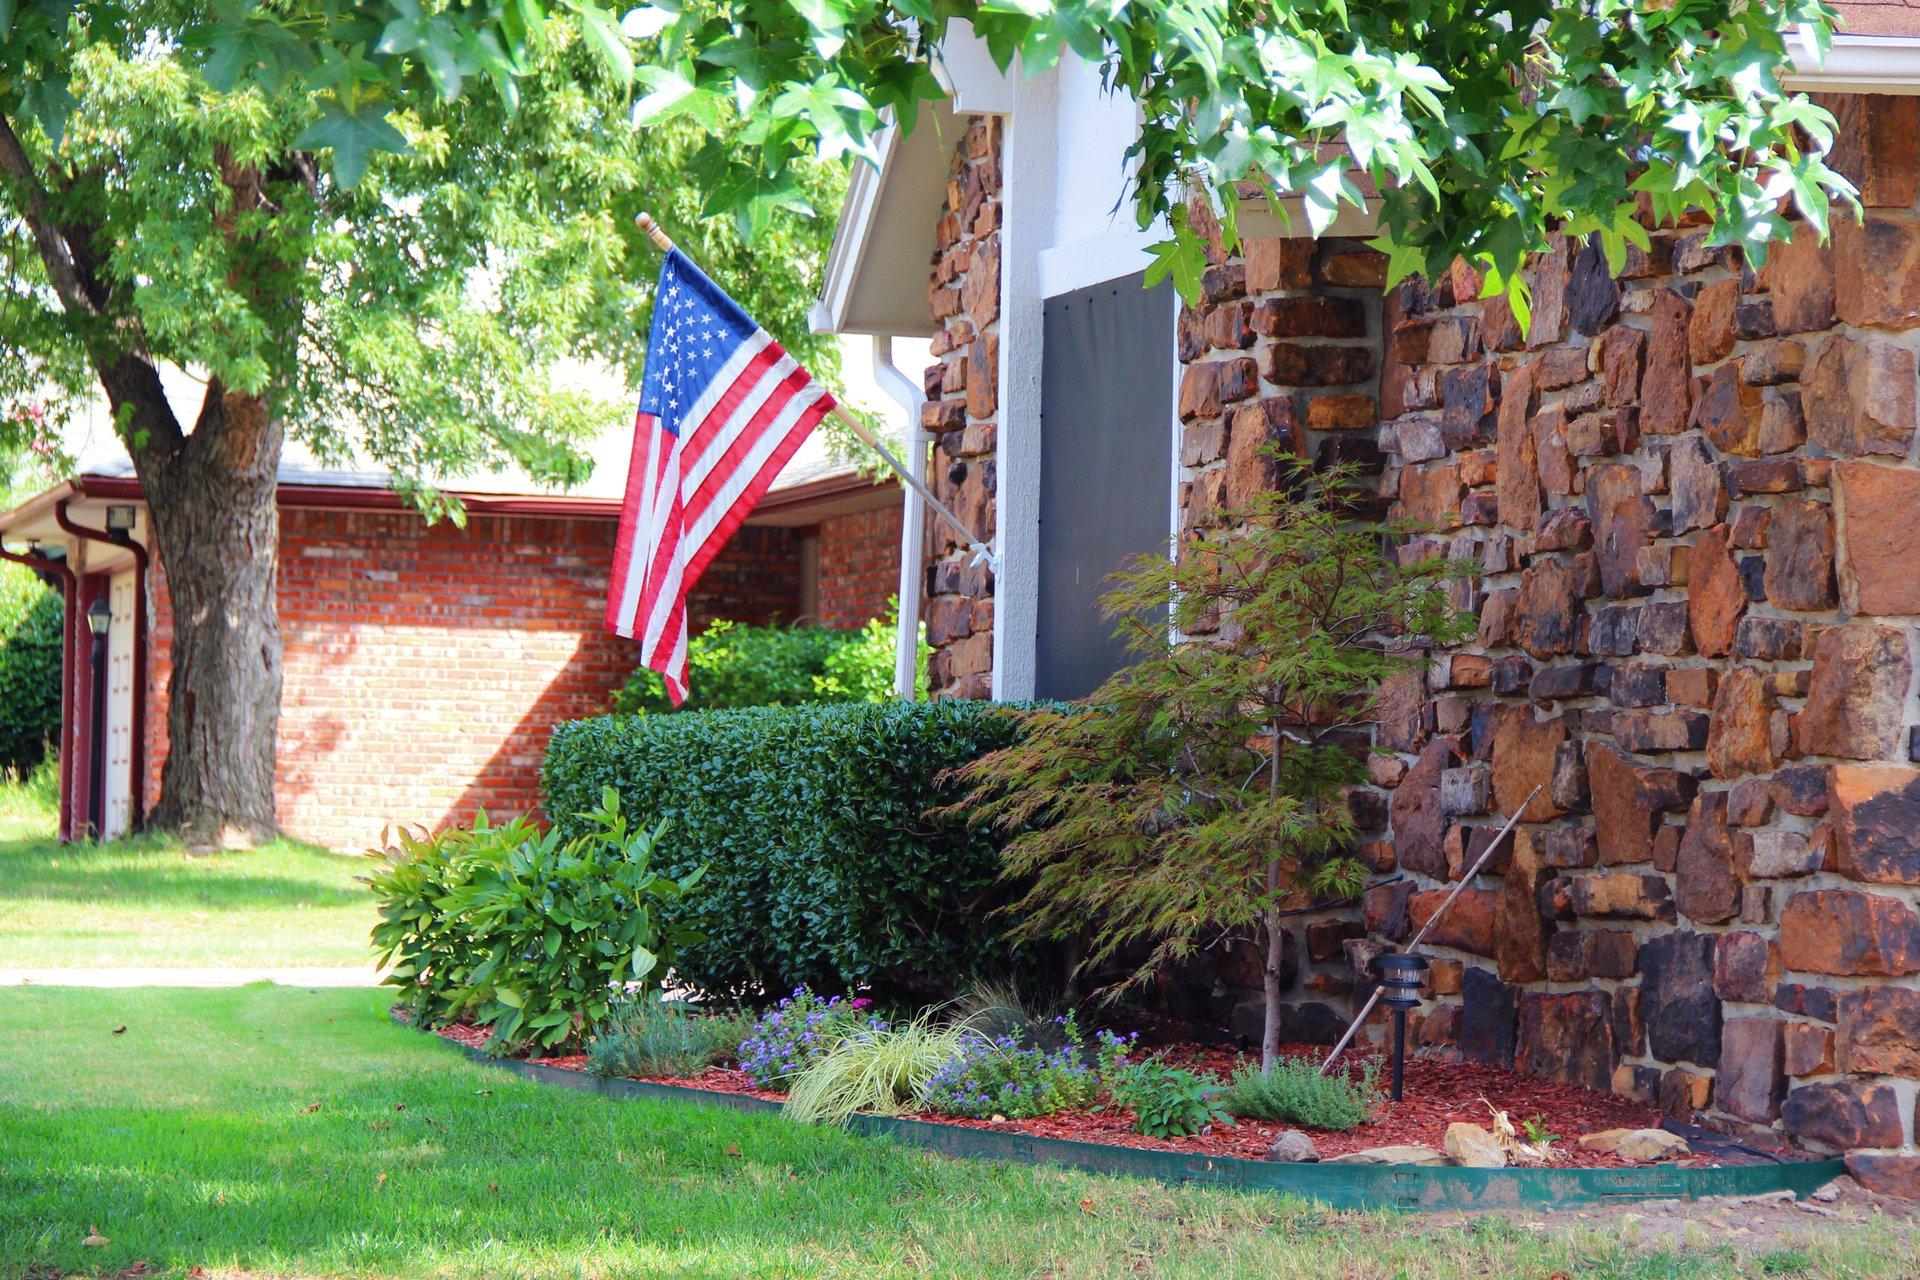 House with U.S. flag